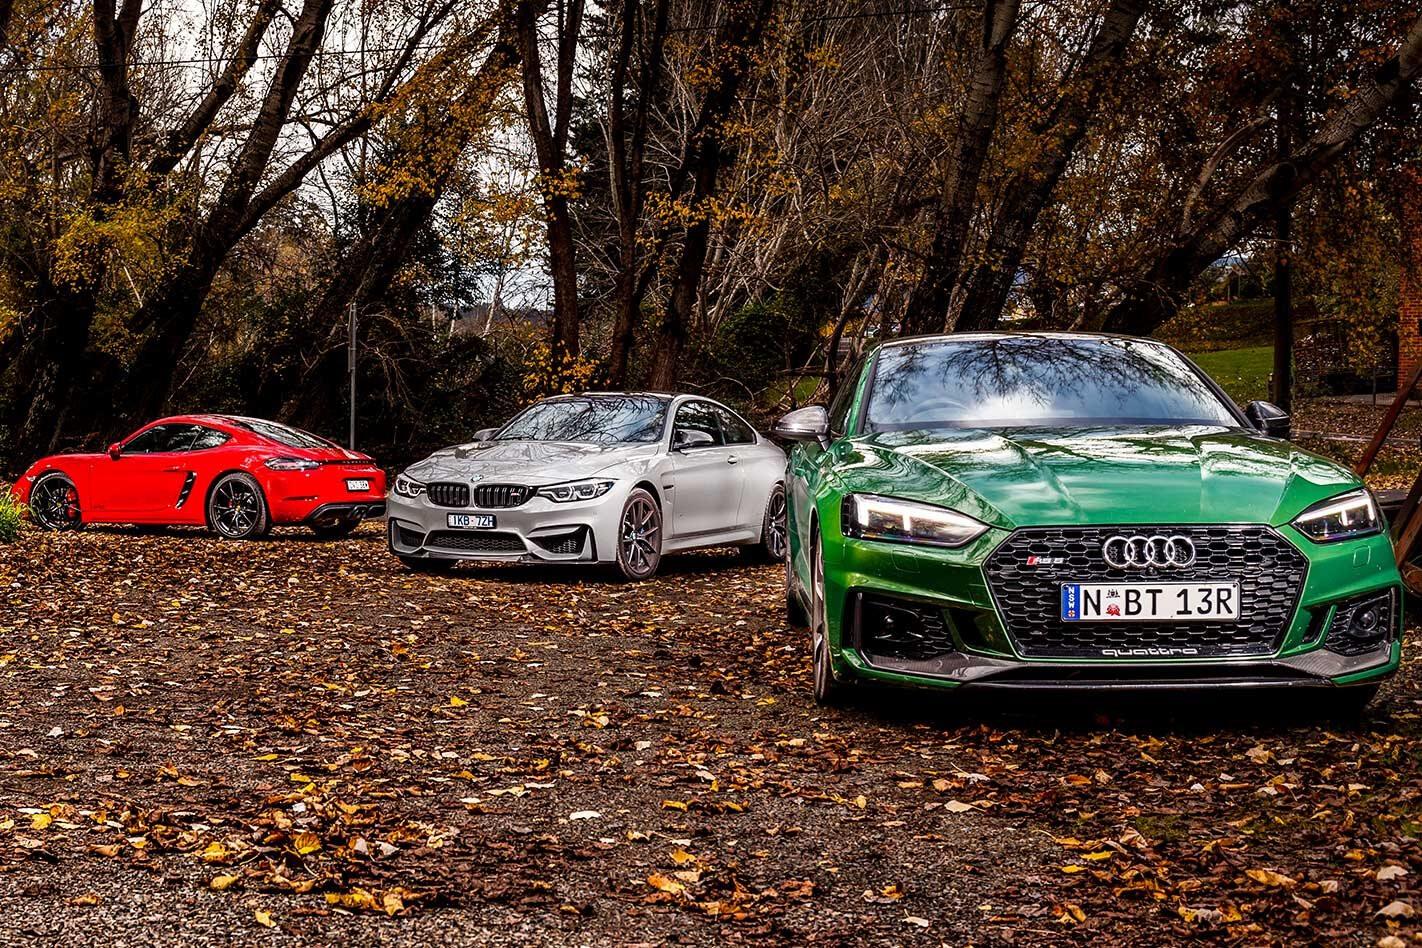 2018 Audi RS5 v BMW M4 CS v Porsche 718 Cayman GTS comparison